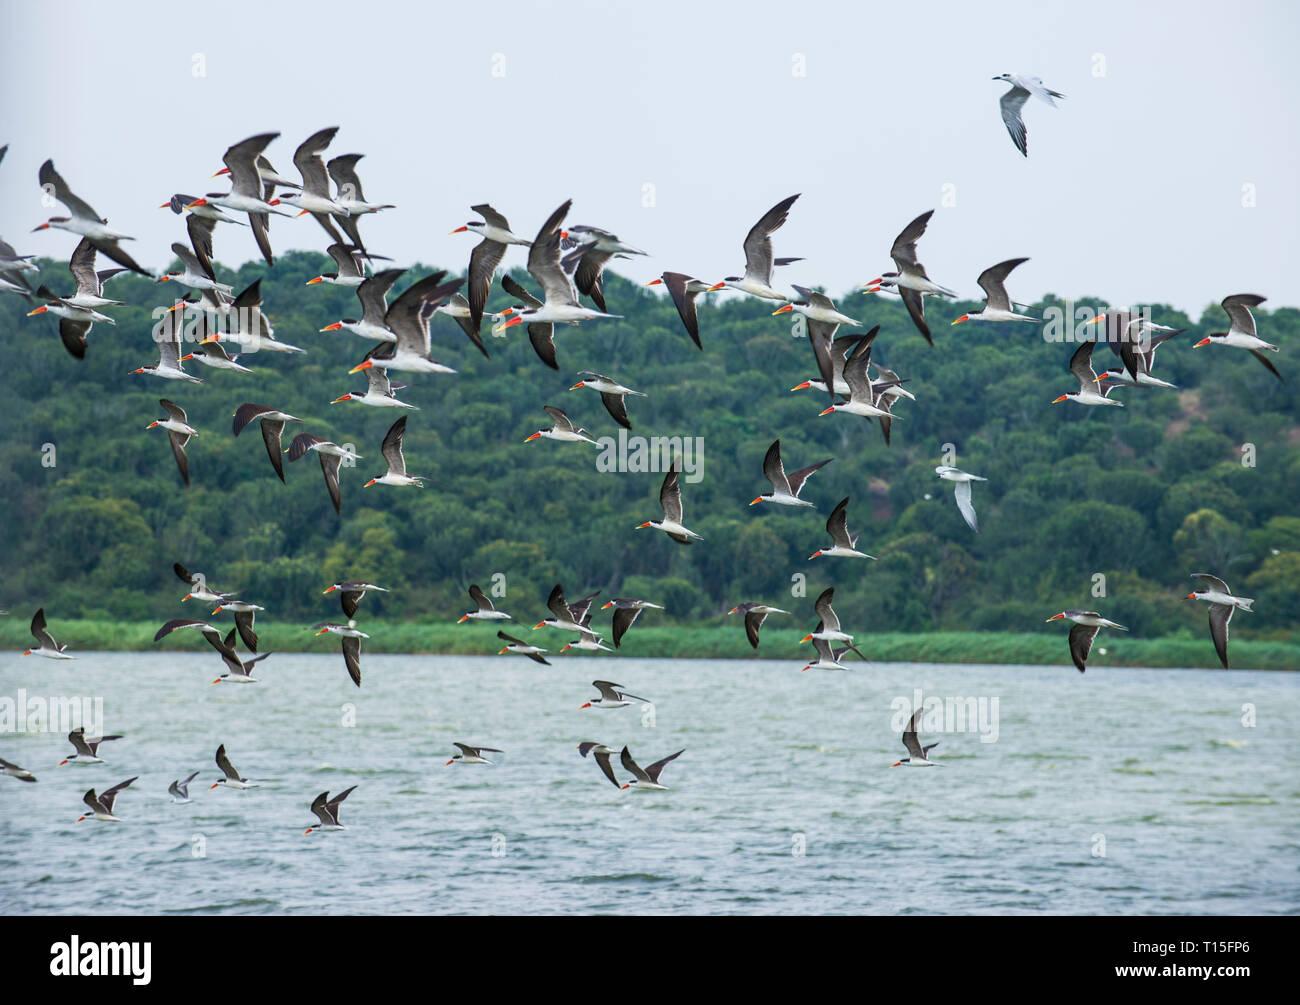 Africa, Uganda, Huge flocks of birds, Queen Elizabeth National Park - Stock Image